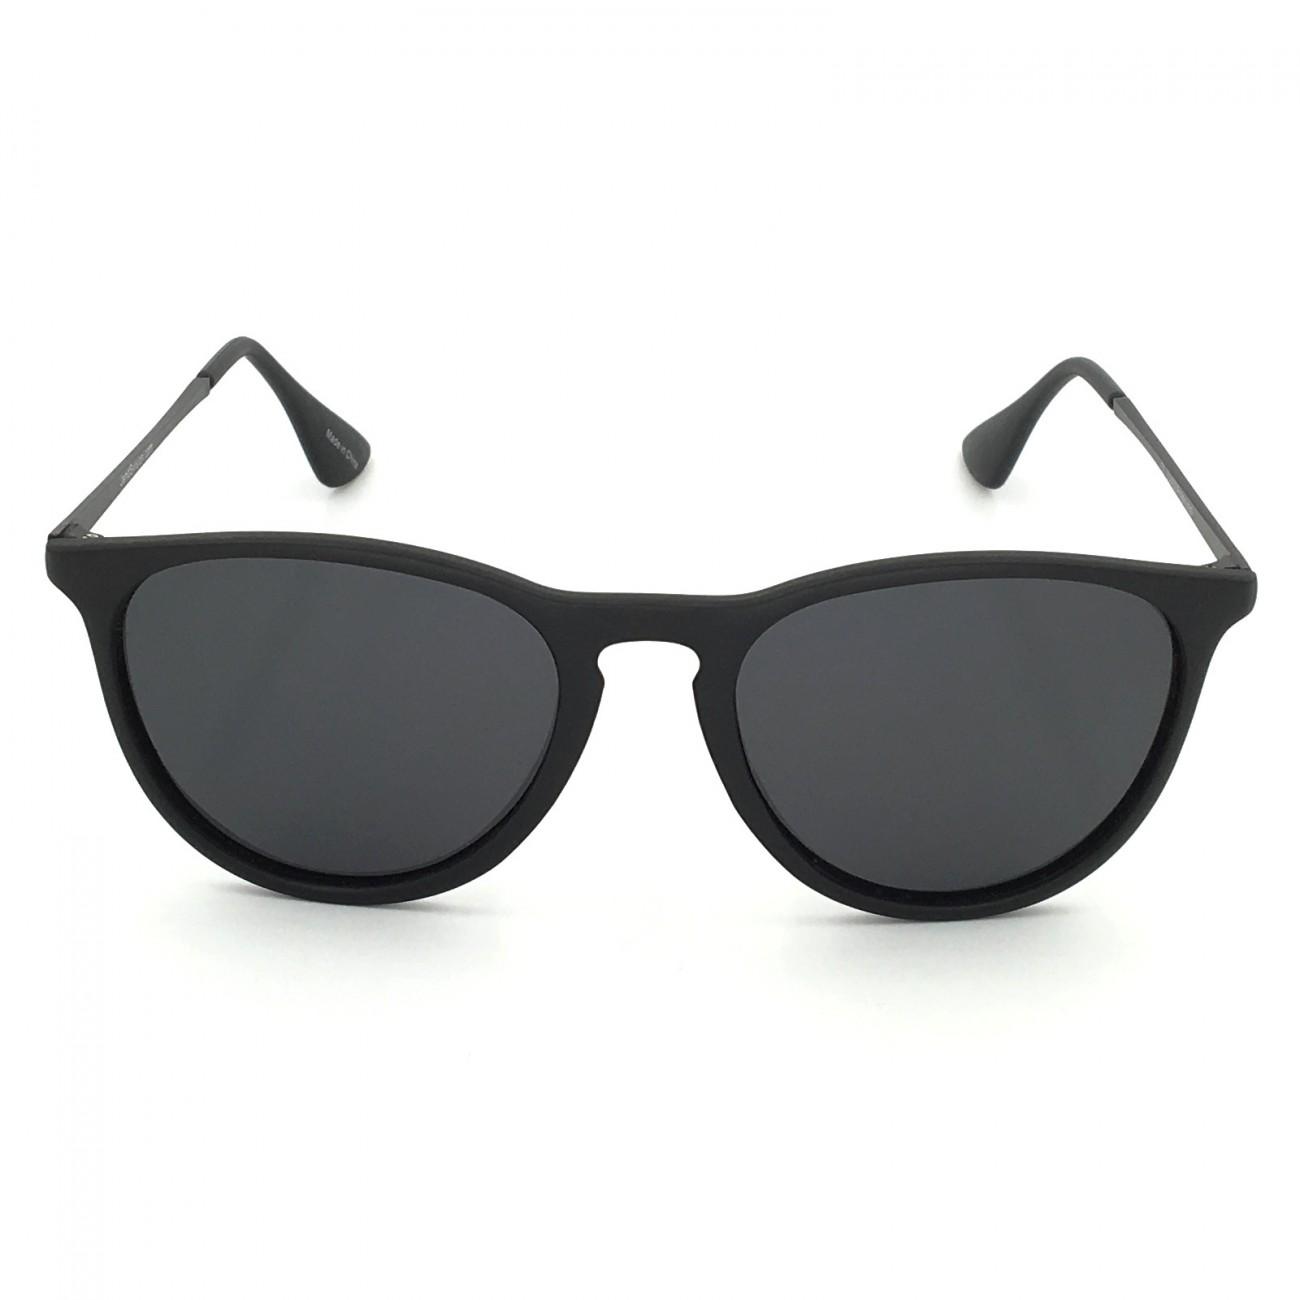 J+S Piha Chic Round Cat Eyes Sunglasses, Polarized Lens ...